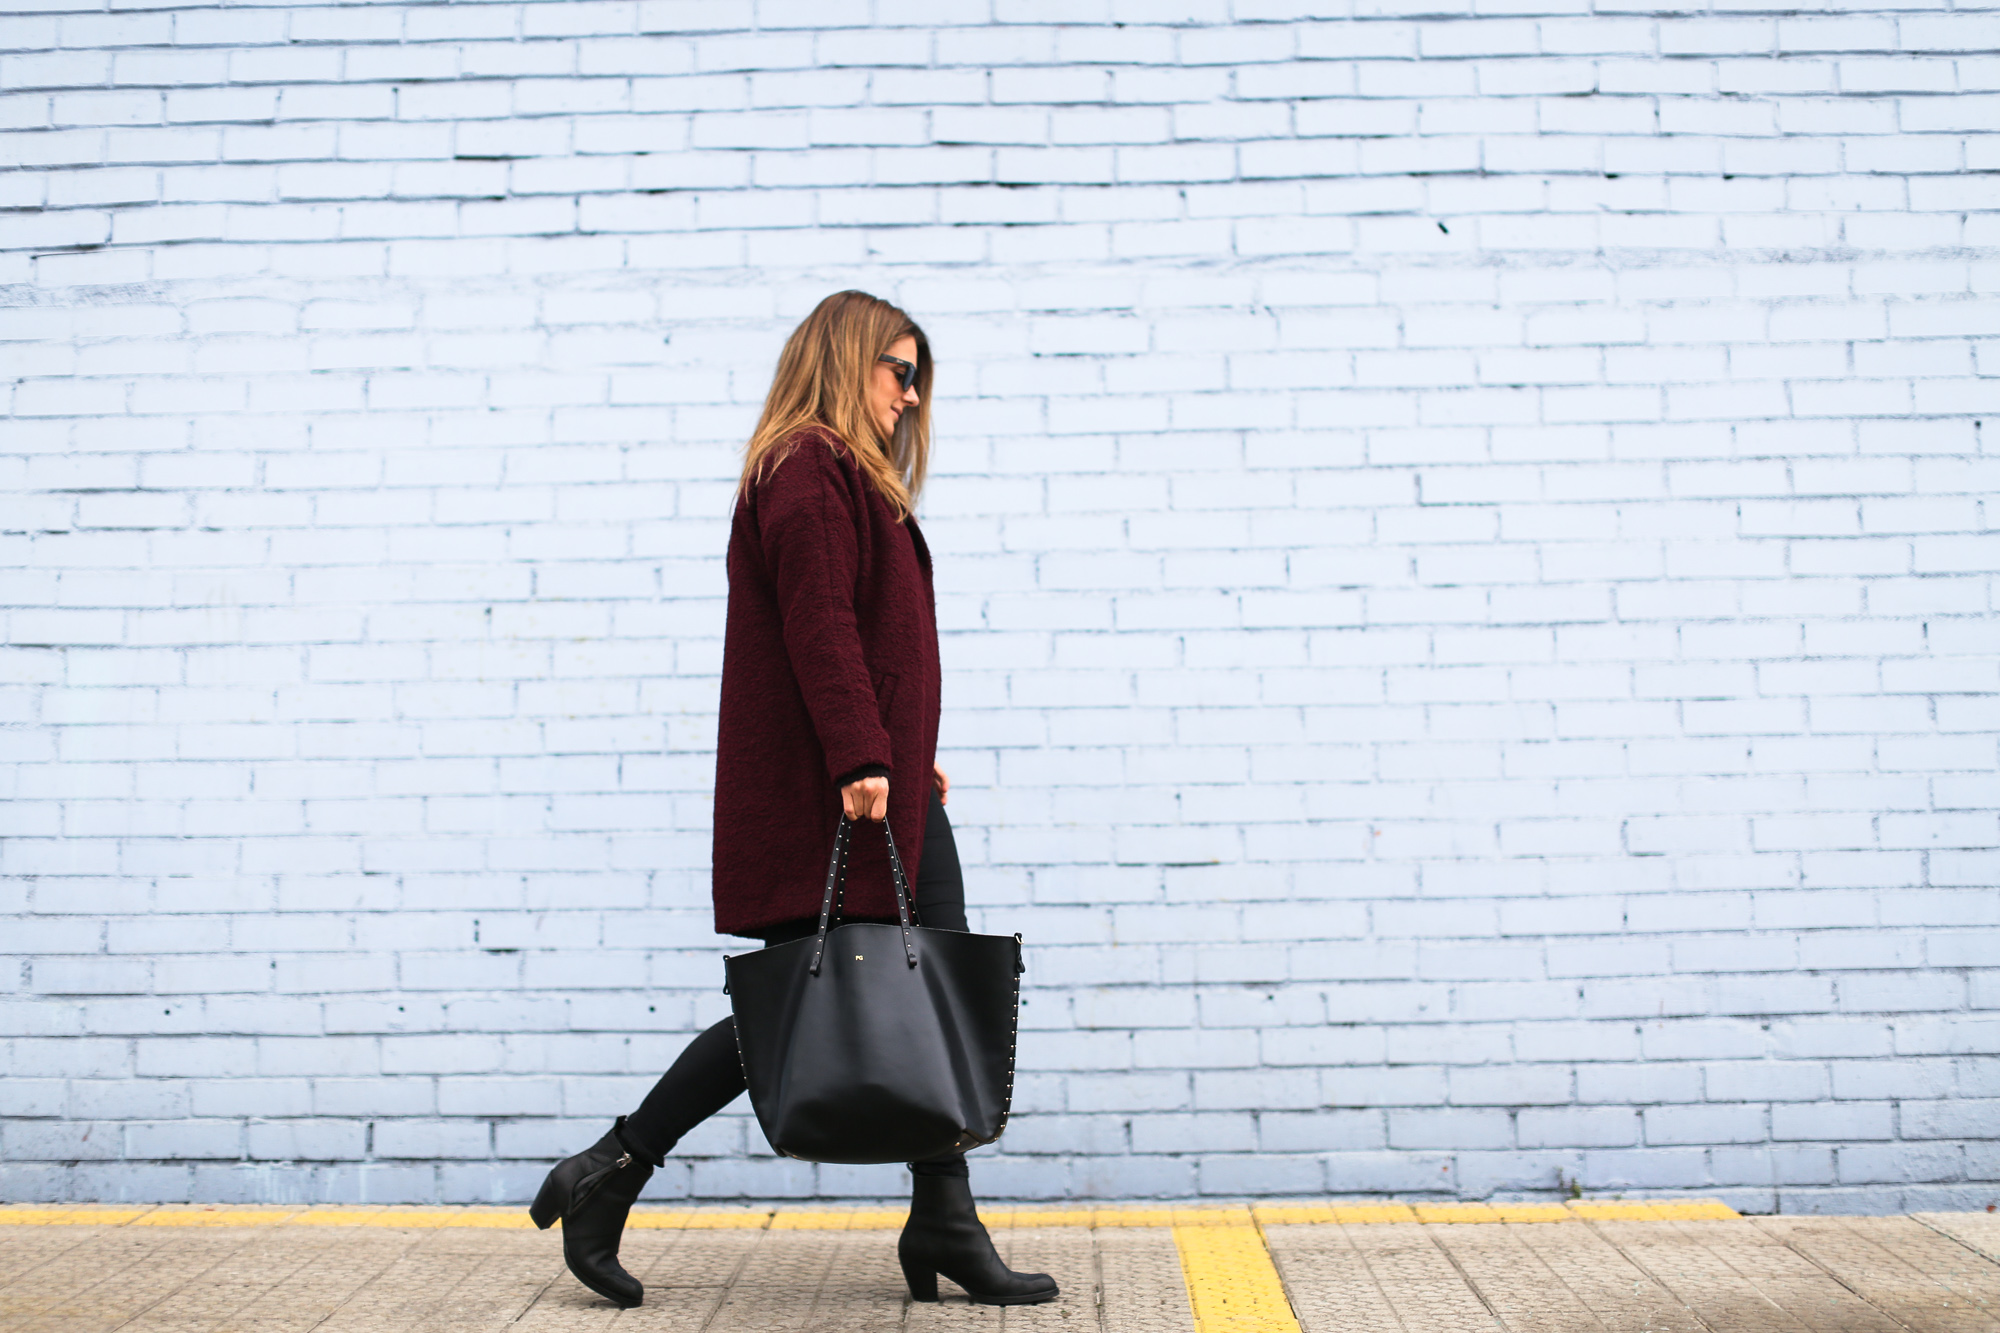 Clochet_streetstyle_burgundy_wool_coat_acne_studios_pistol_boots-6